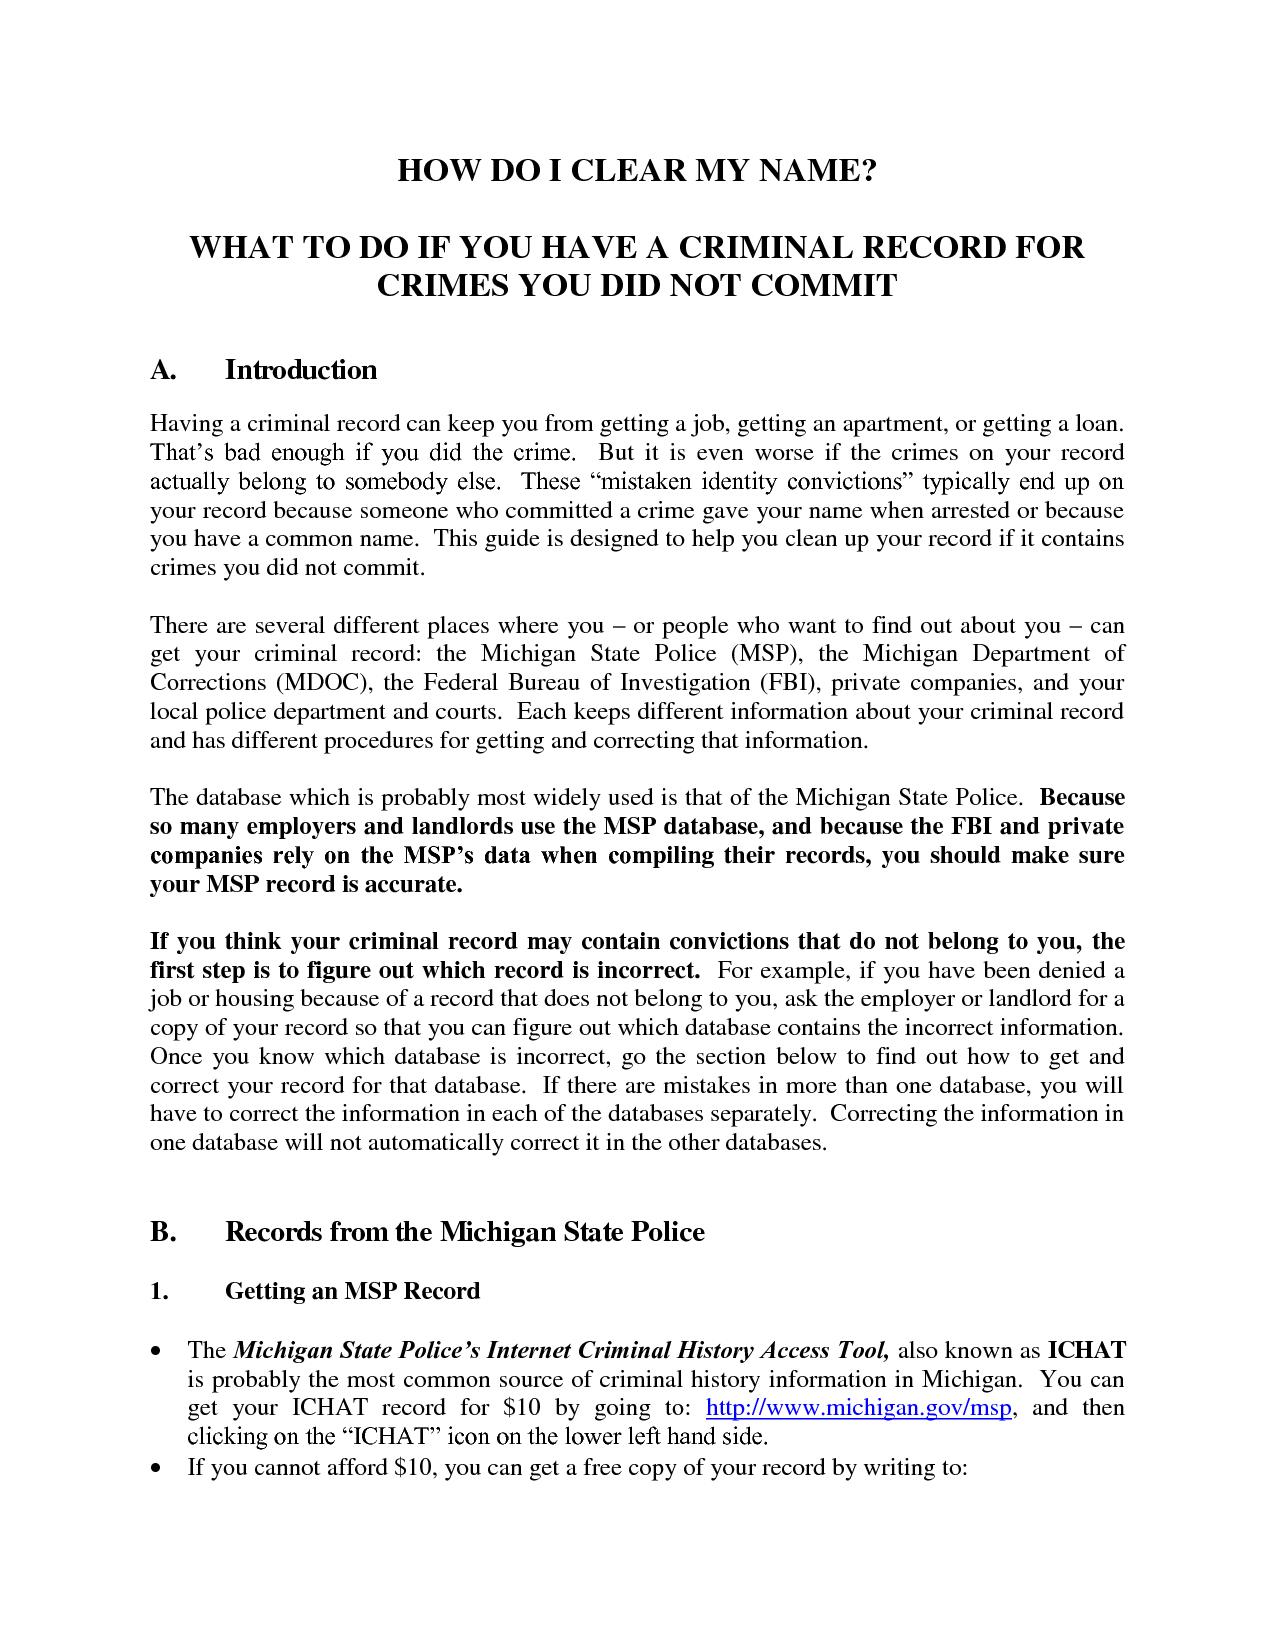 Public Record Removal Letter Template - Fingerprints Request Lettervolunteer Police Clearance Request Letter